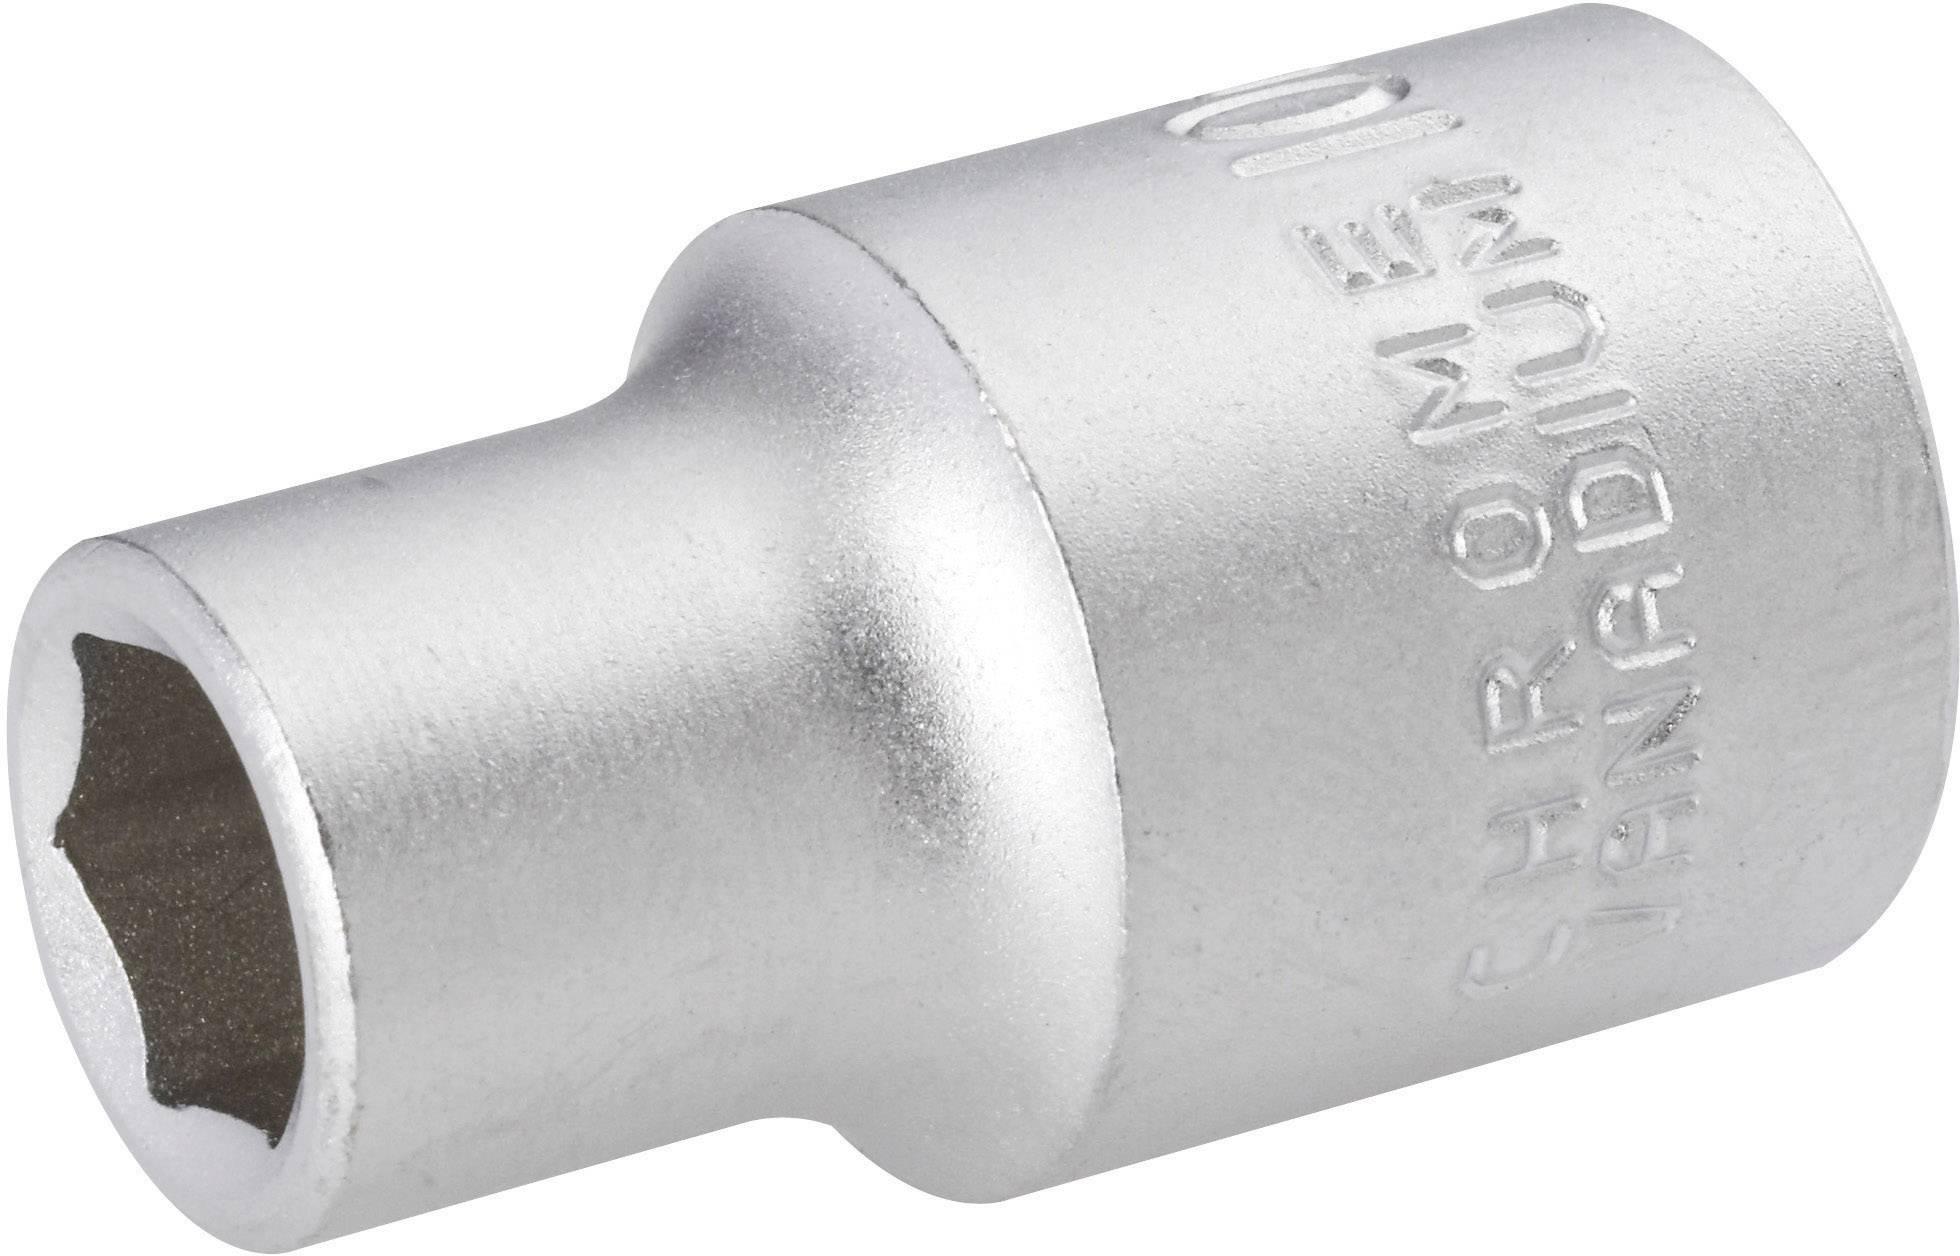 "Nadstavec na račňu TOOLCRAFT 820766, 1/2"" (12.5 mm), 13 mm"